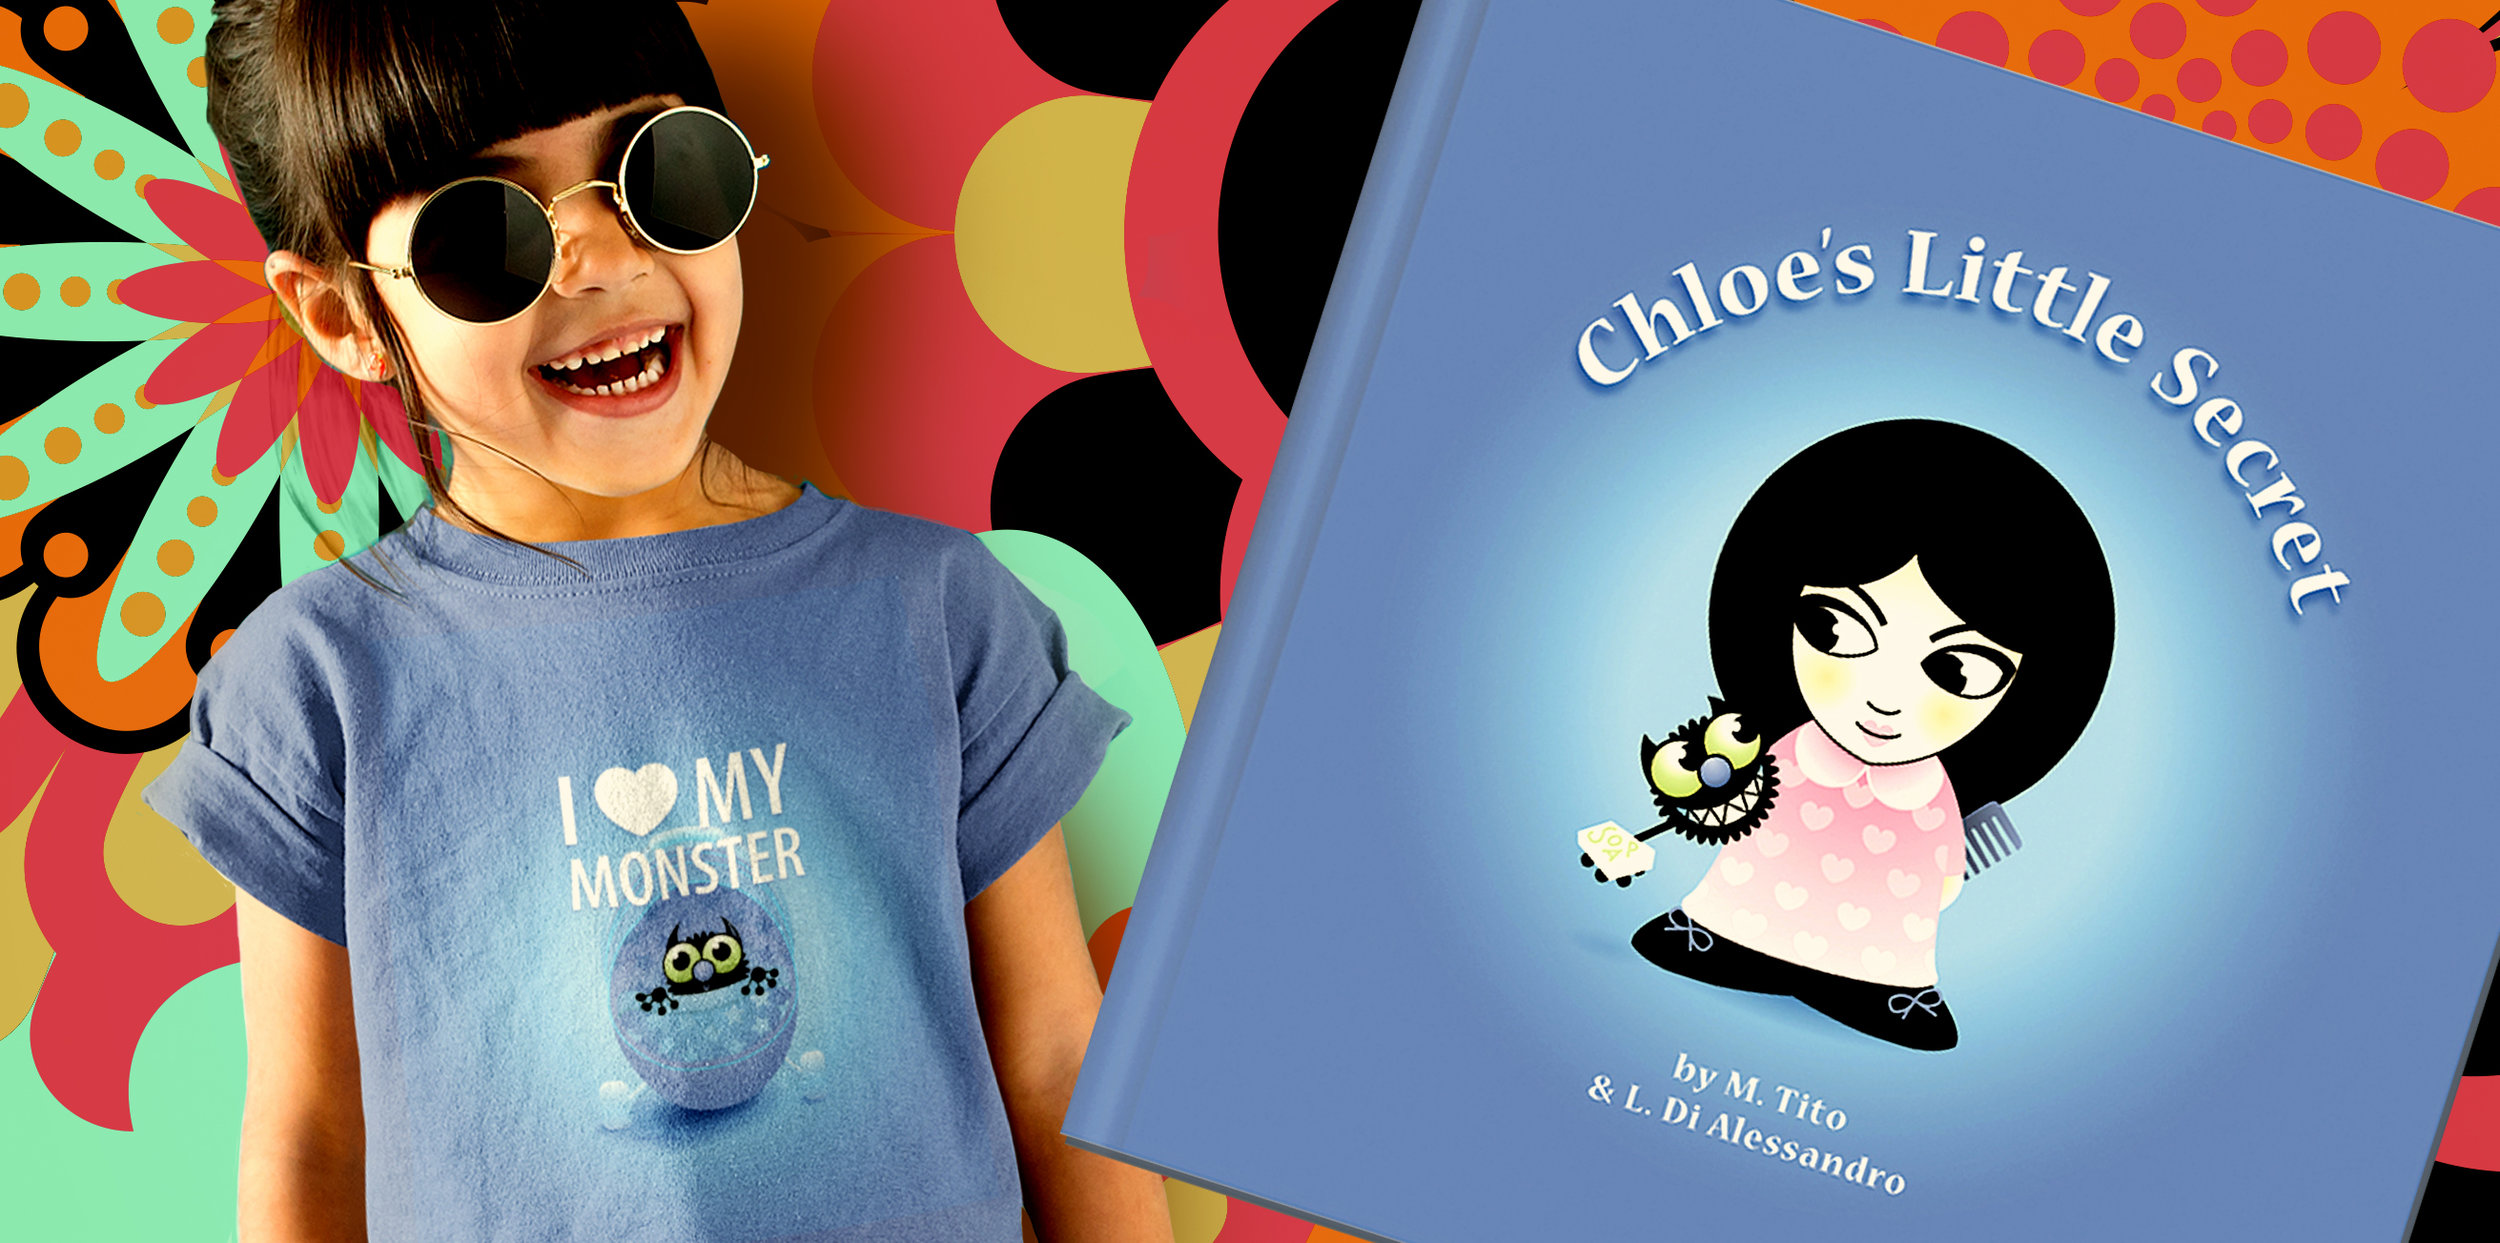 Childrens_Picture_Books-Chloes_Little_Secret.jpg